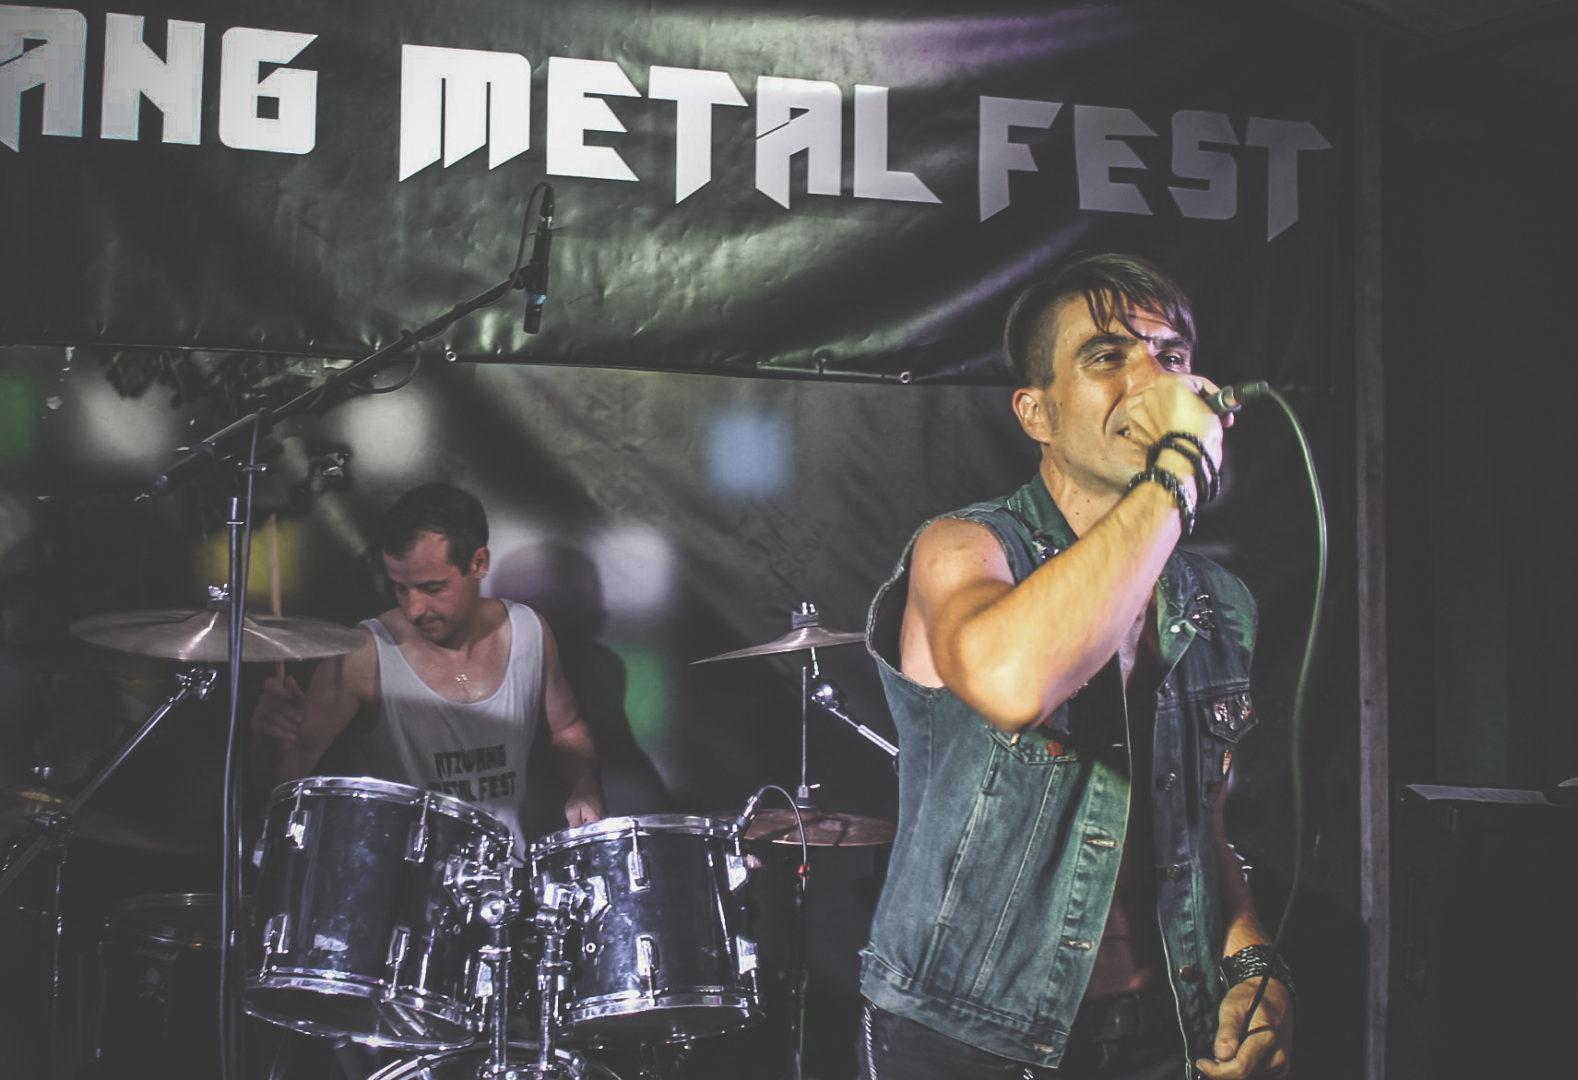 Anguish Force Atzwang Metal Fest 2019 27 - Atzwang Metal Fest 9 - live